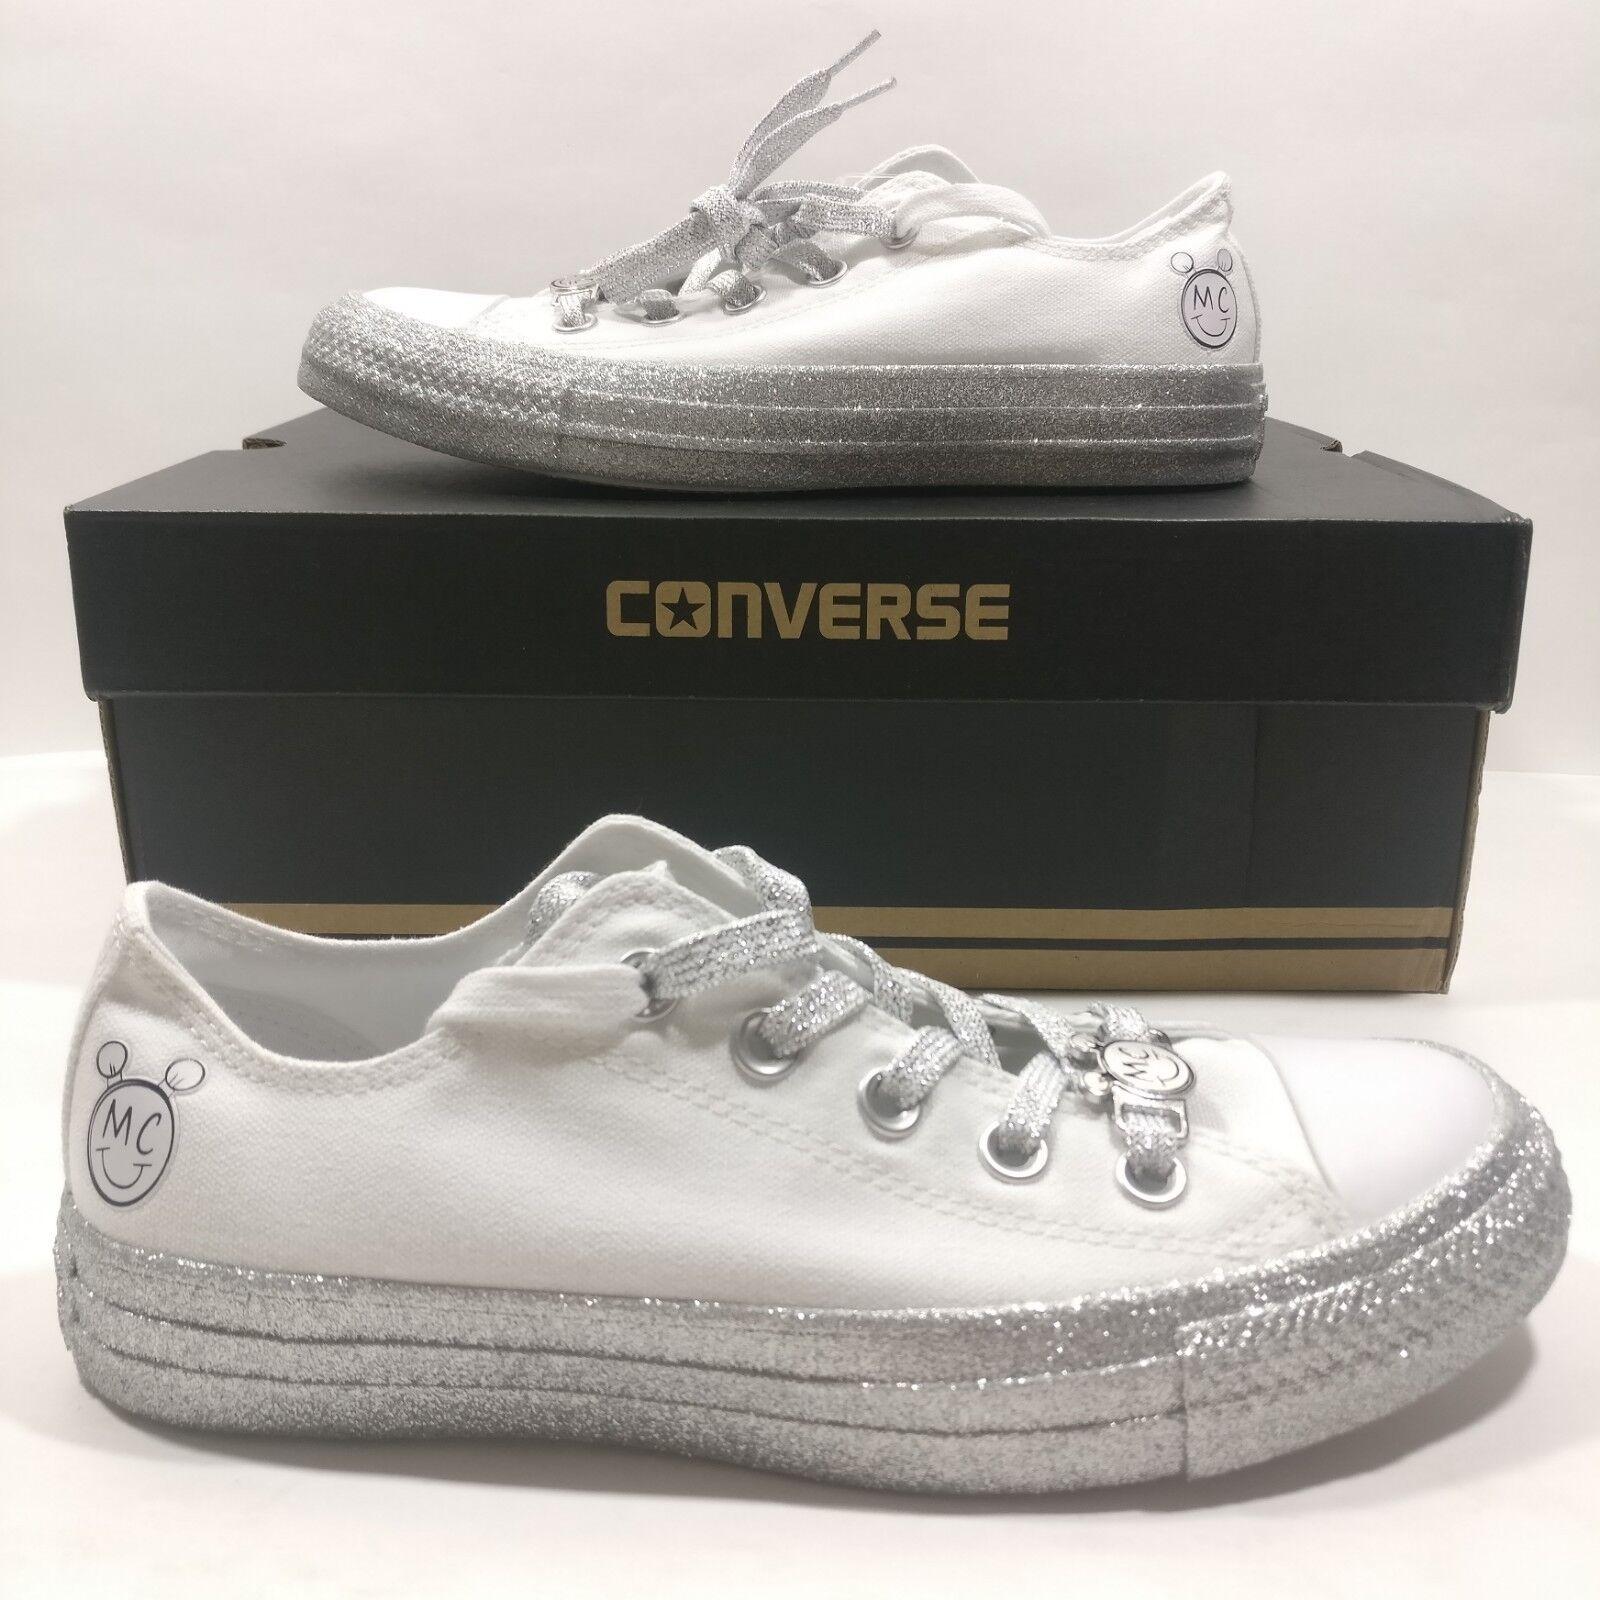 Converse X Miley Cyrus Chuck Taylor All Star Weiß Platinum Multi Größe 162238C